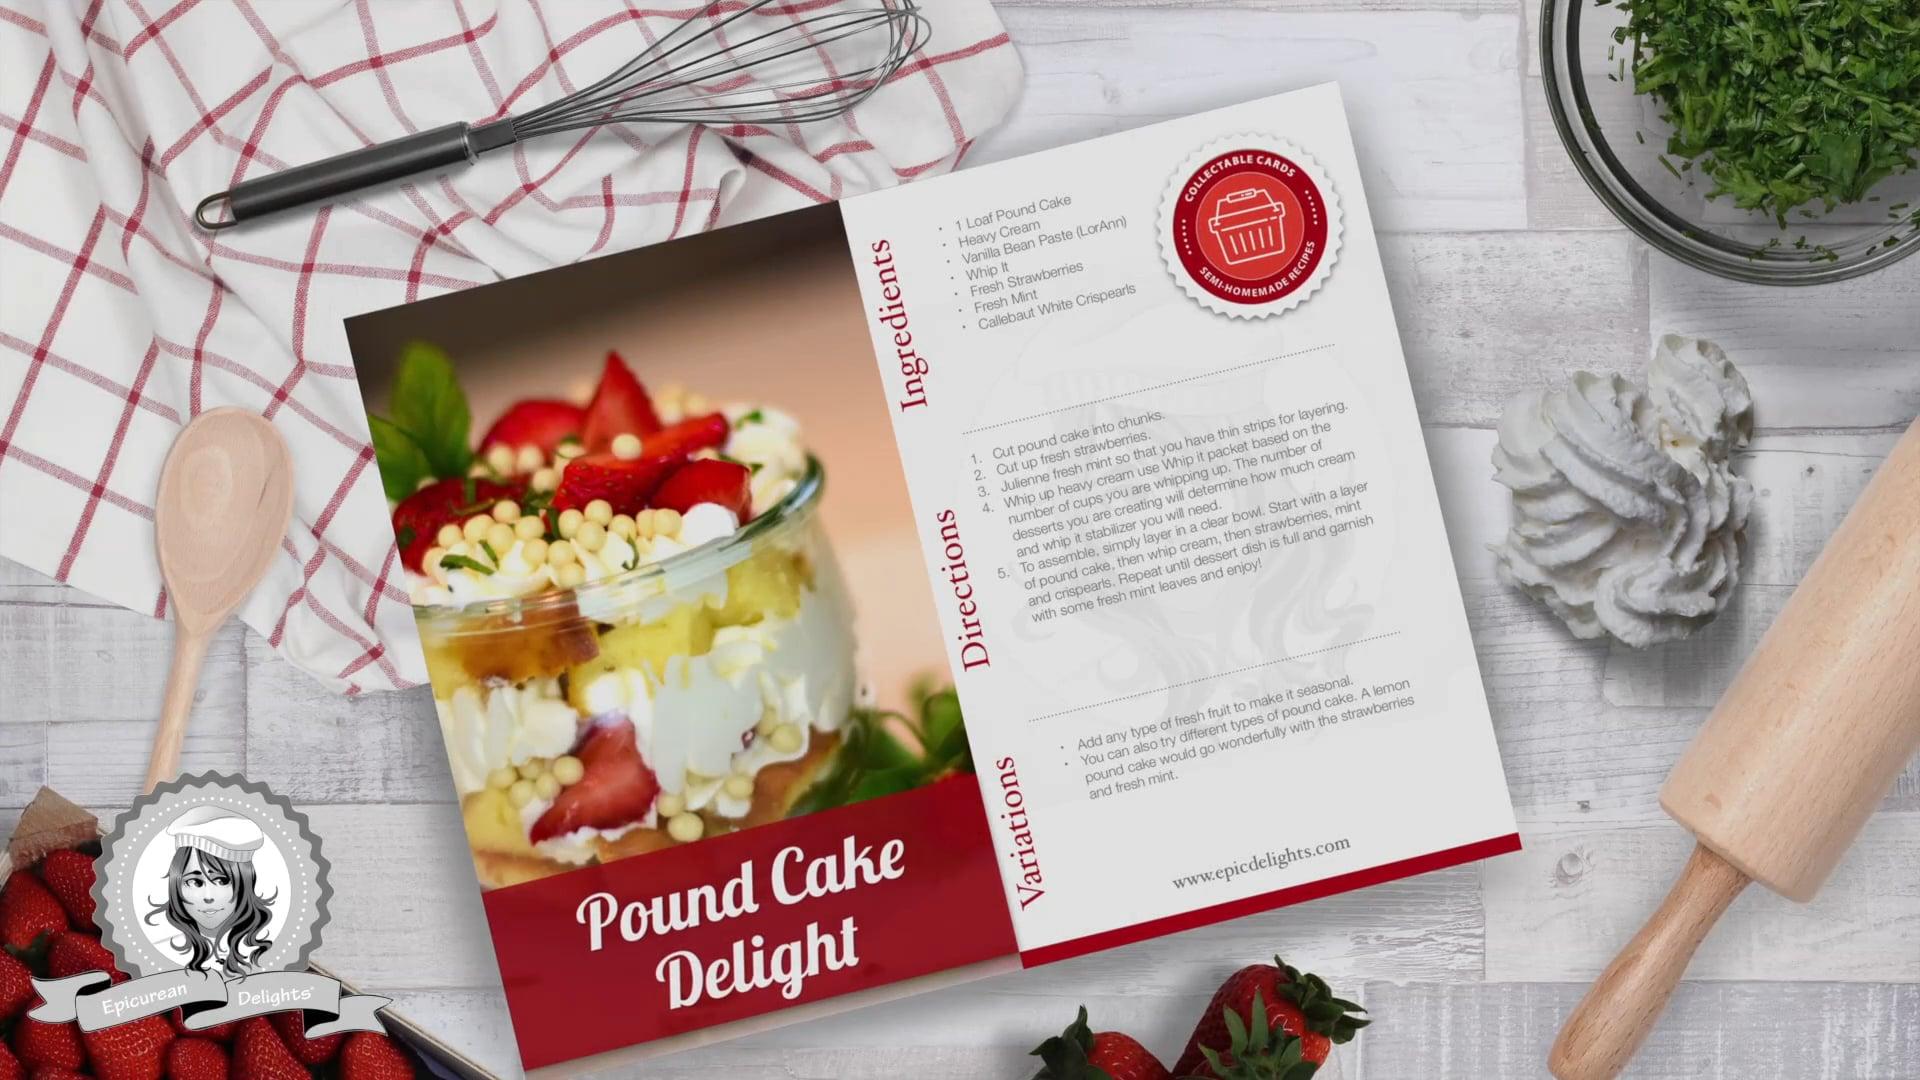 Free Video: Semi-homemade Pound Cake Dessert